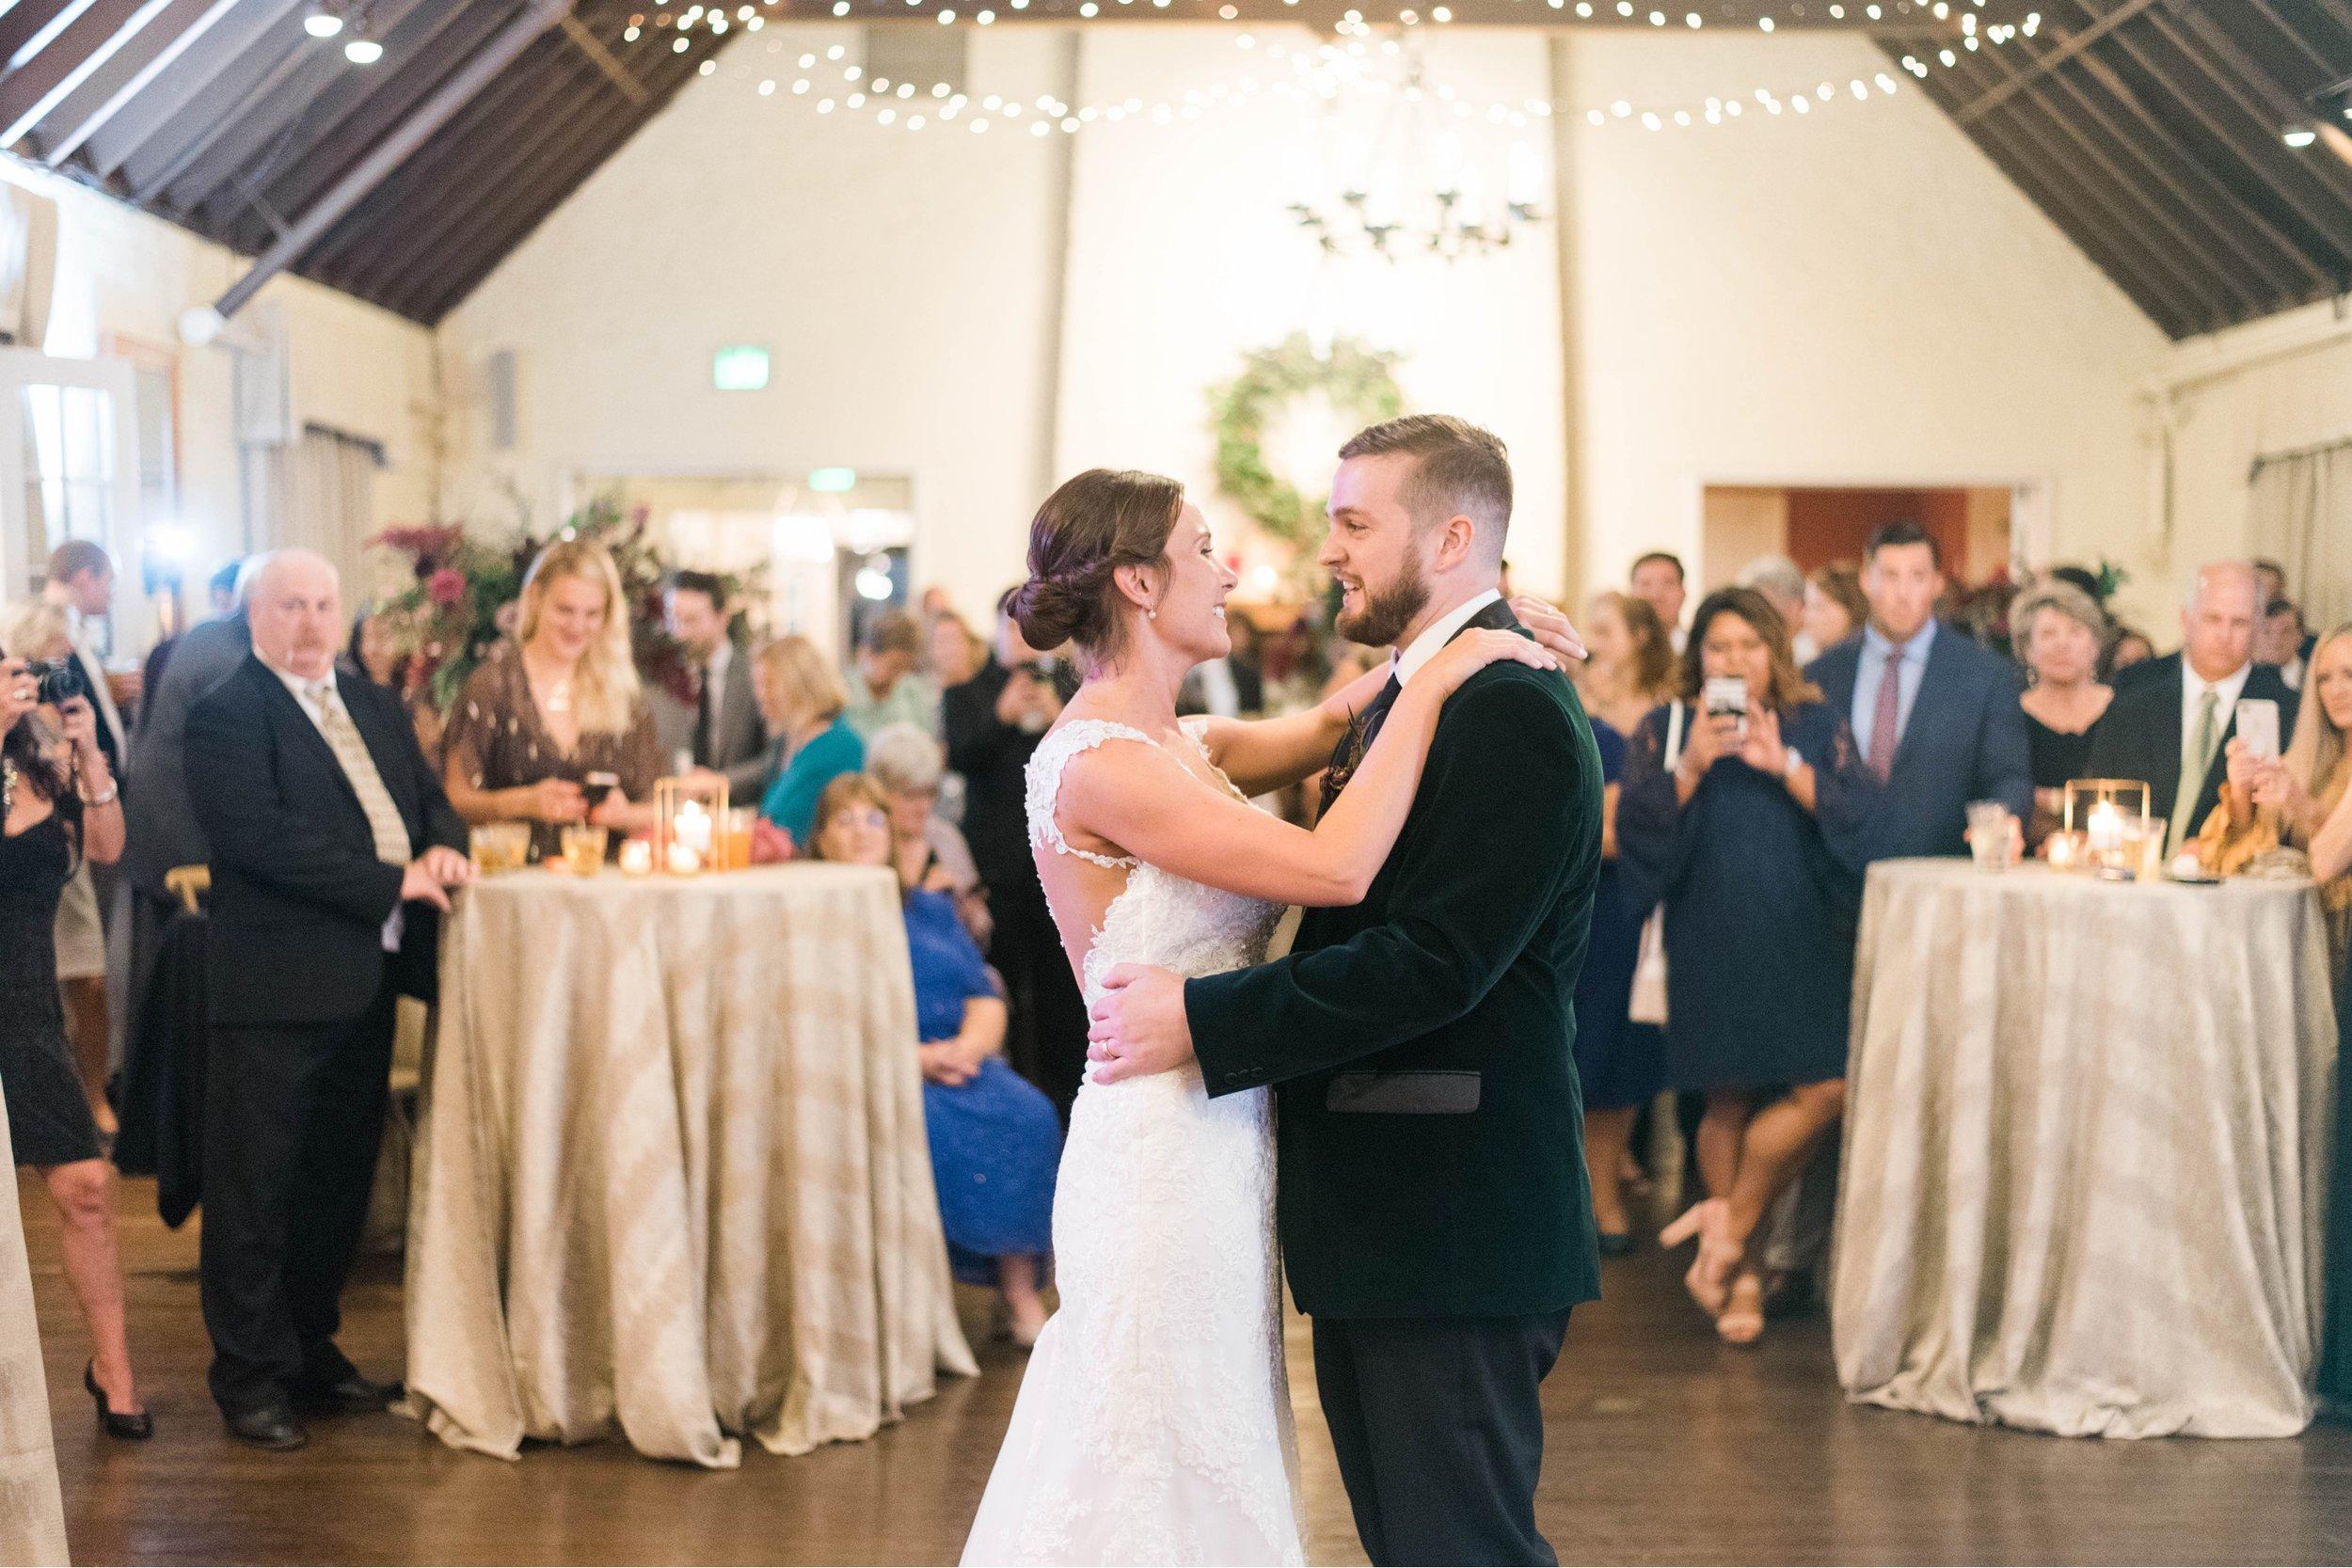 Gordan+Lauren_BoonsboroCountryClubWedding_Virginiaweddingphotographer_LynchburgVi 45.jpg